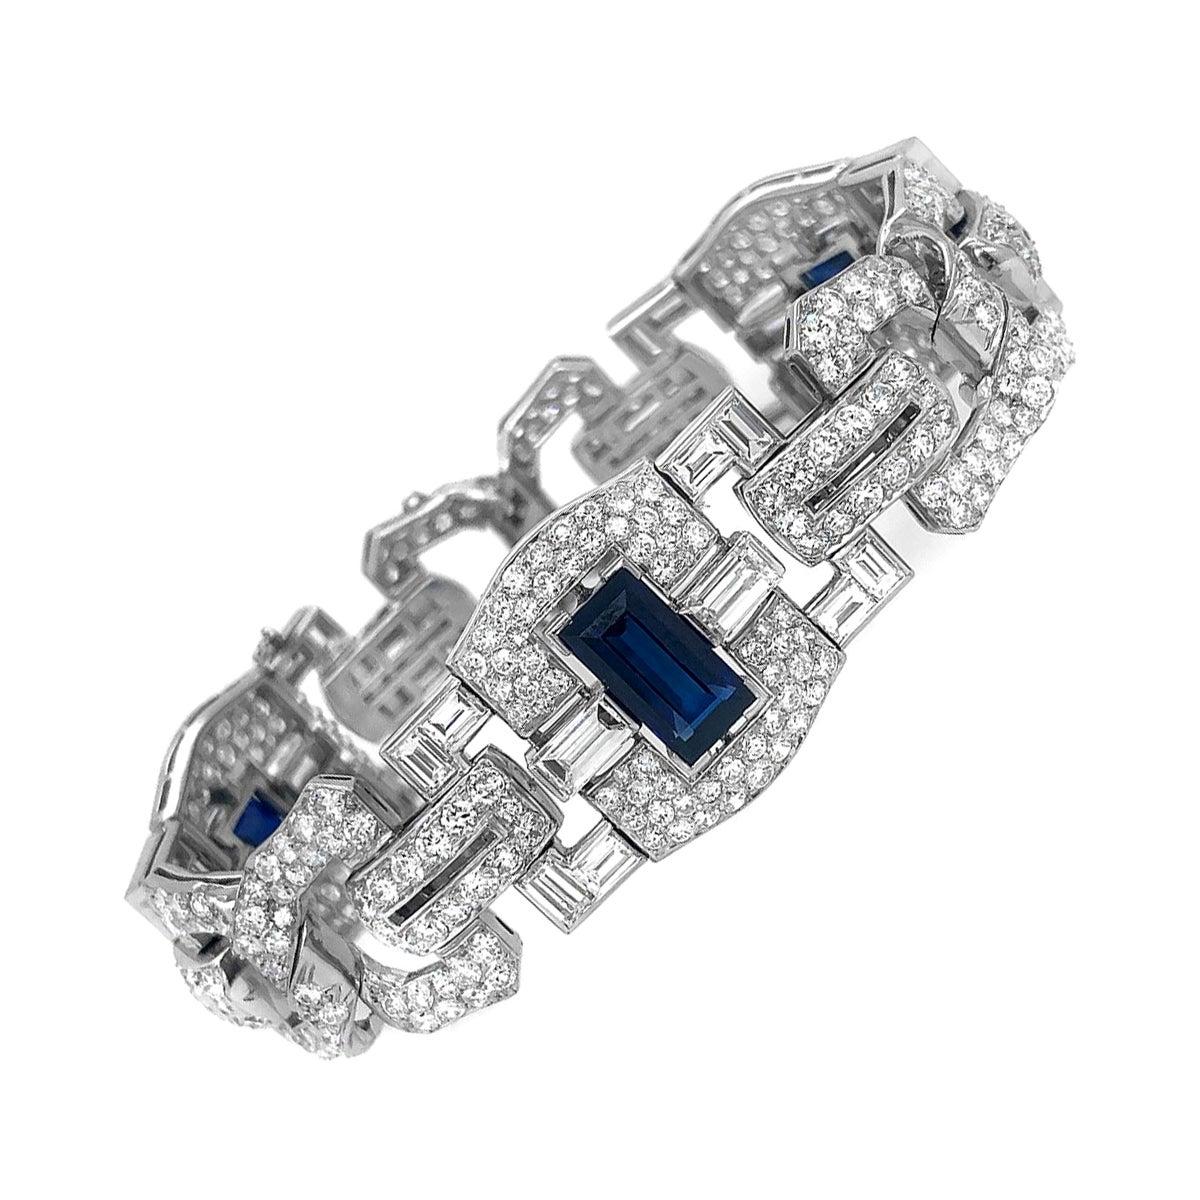 Art Deco Platinum 8 Carat Sapphire 25 Carat Diamond Bracelet